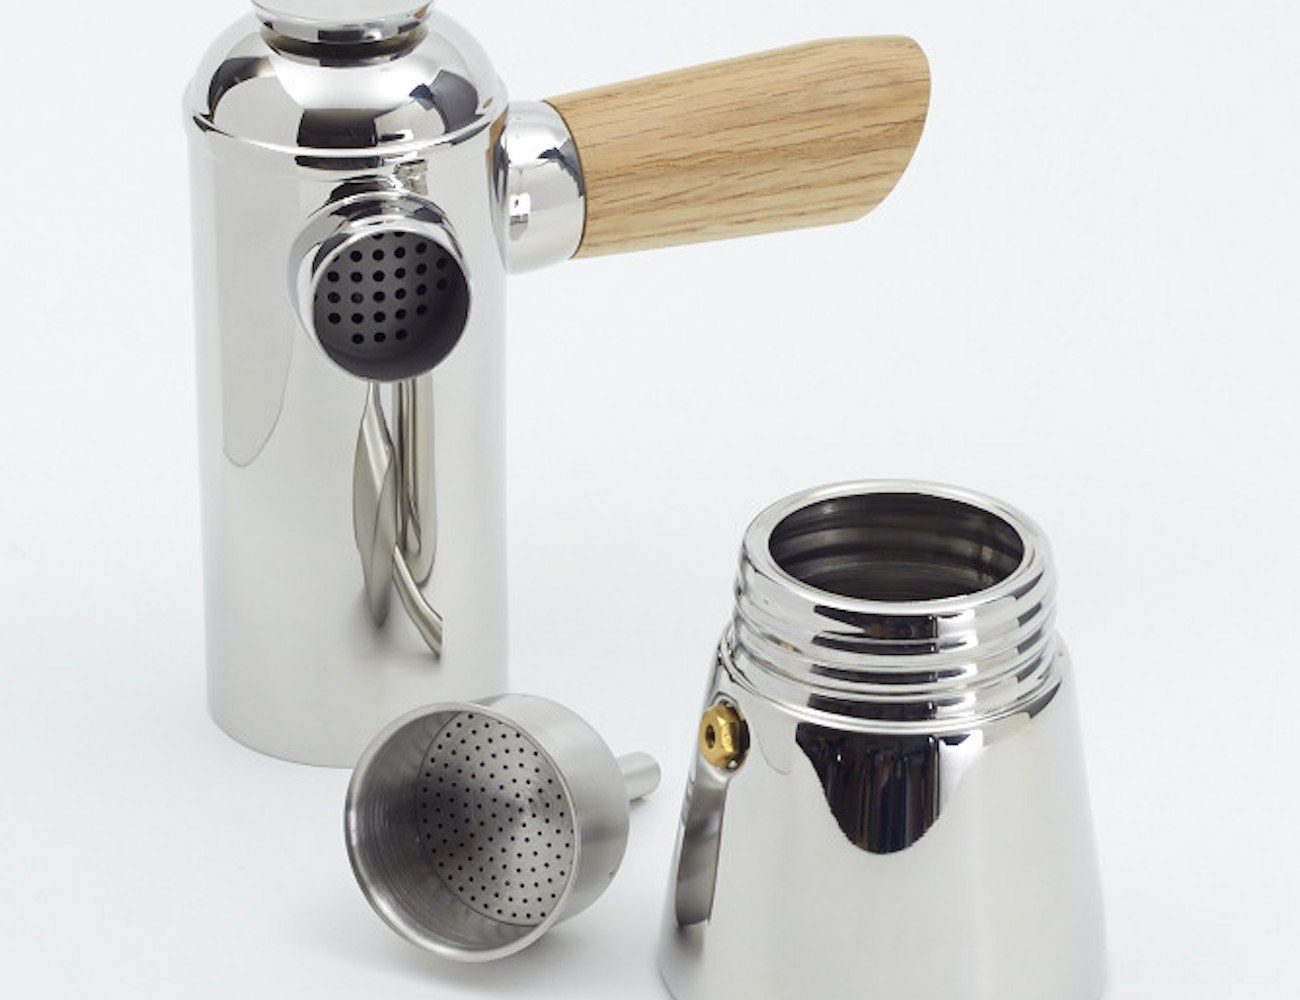 Stove Top Espresso Maker ~ Freud stovetop espresso maker gadget flow